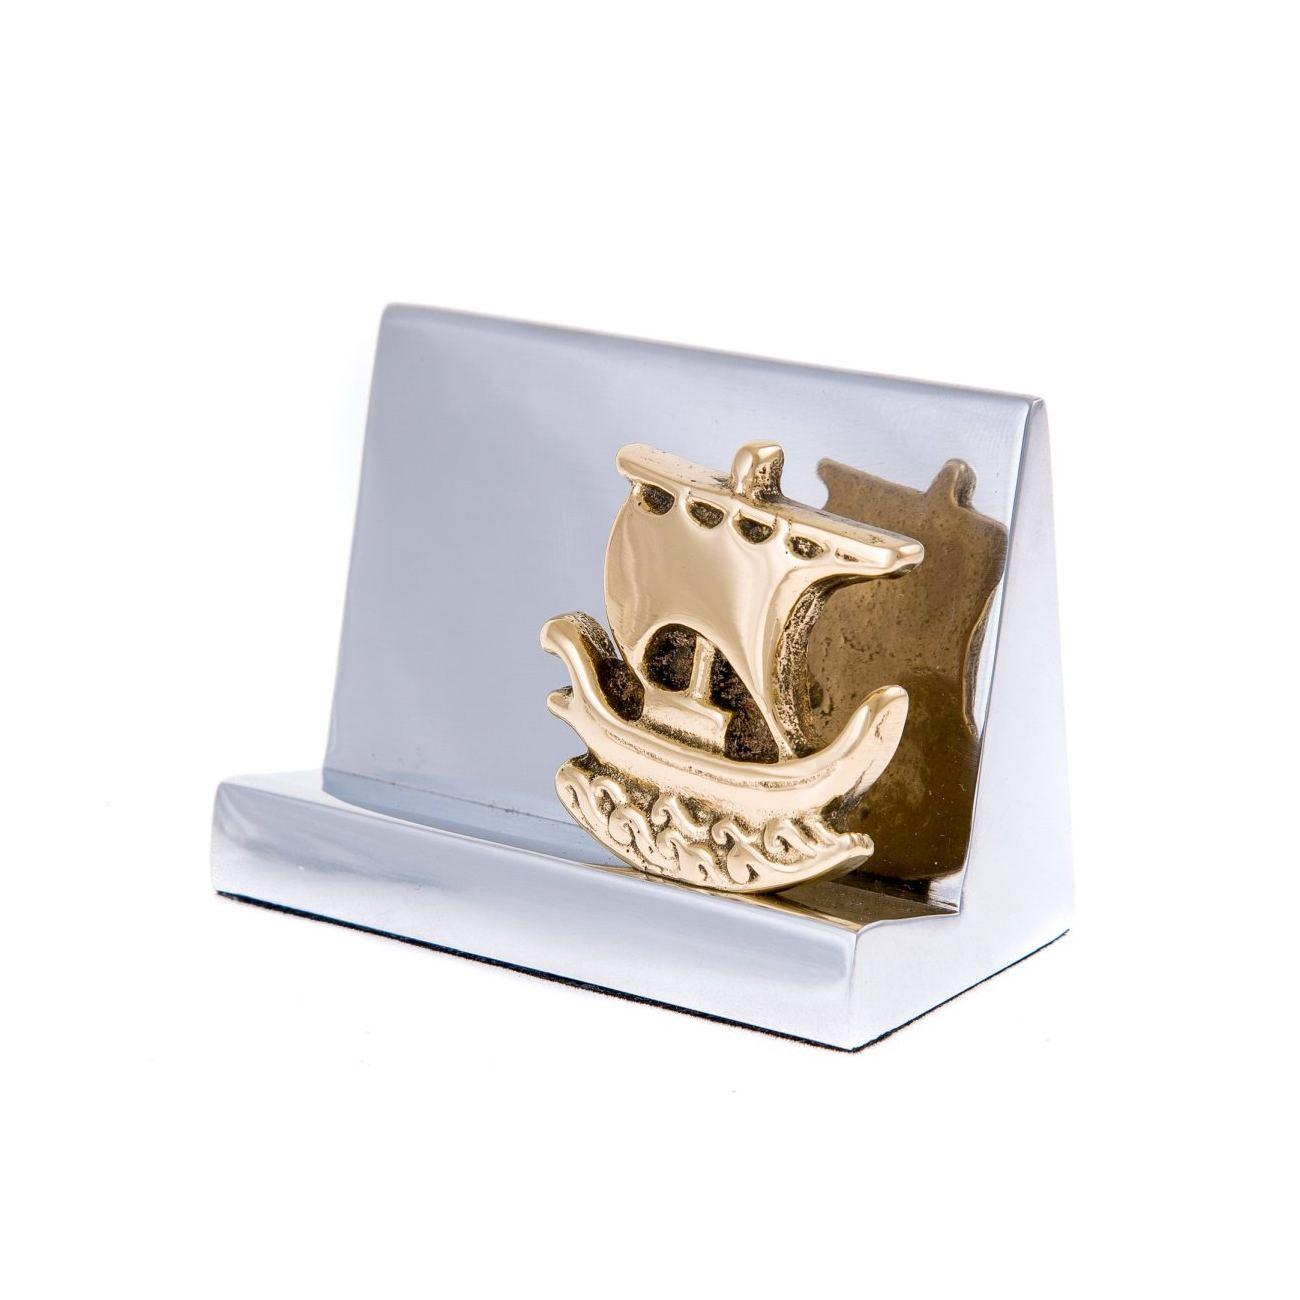 Desk Accessories Set Of 2 Archaic Ship Design Handmade Solid Metal Decorative Storage Box Business Card Holder